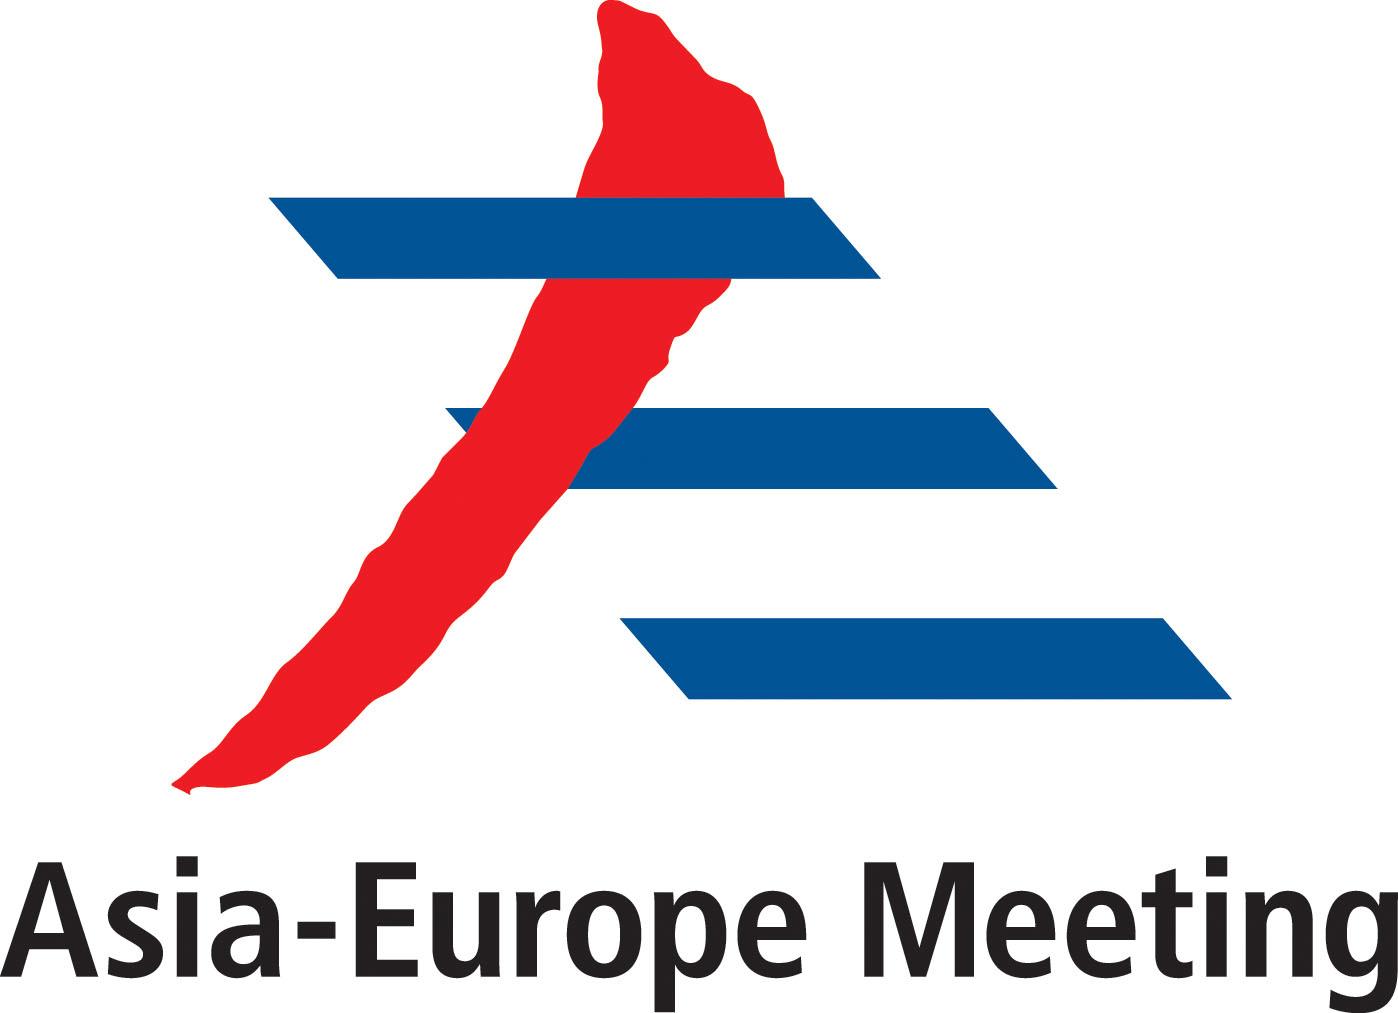 logo for Asia-Europe Meeting